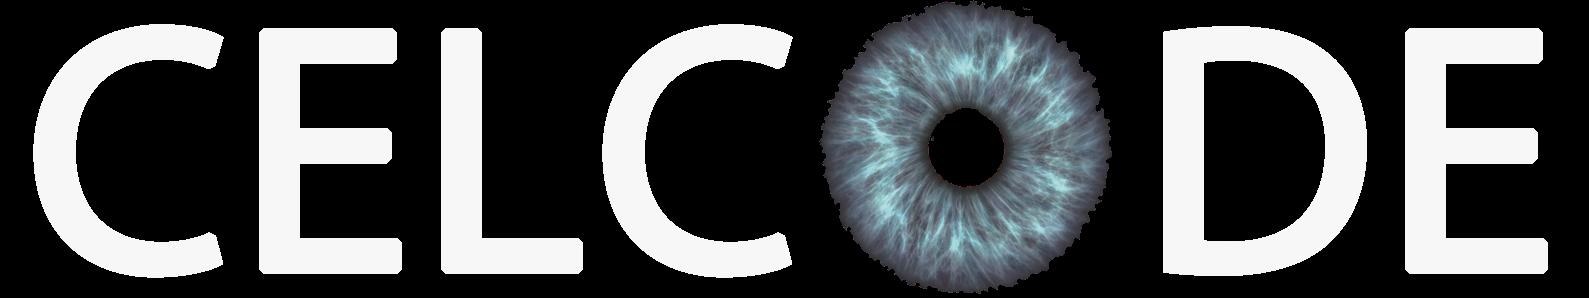 Celcode разработка сайтов